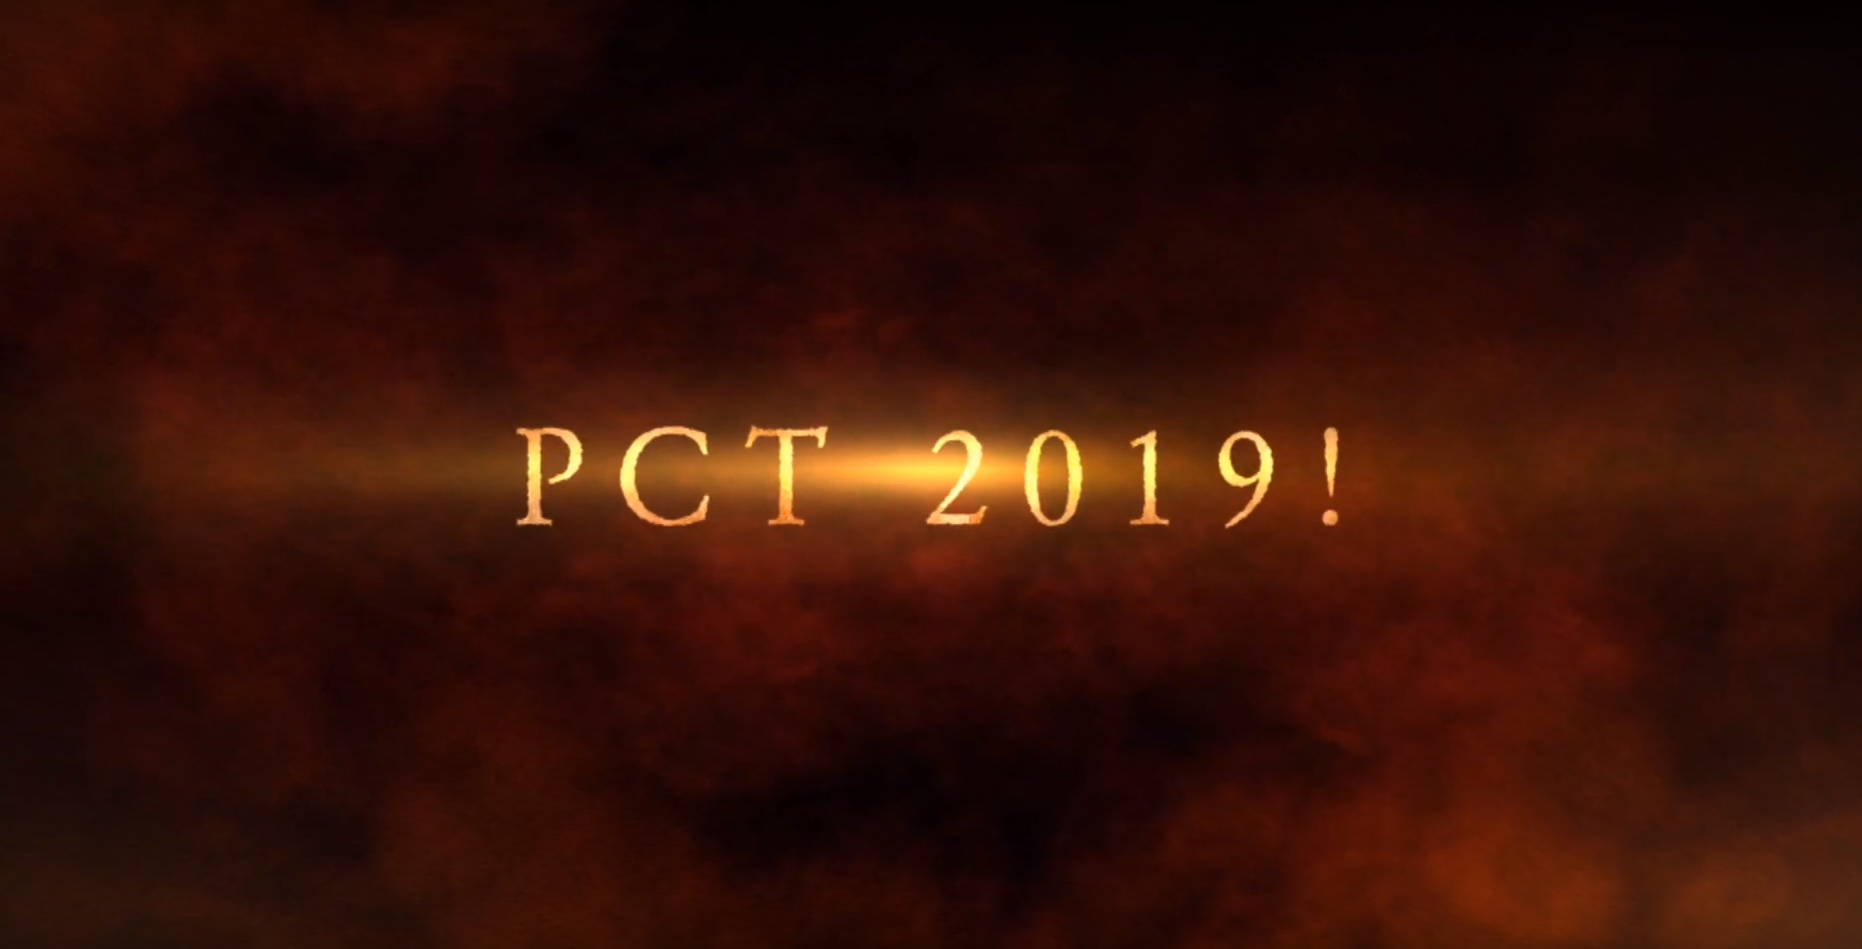 PCT 2019!